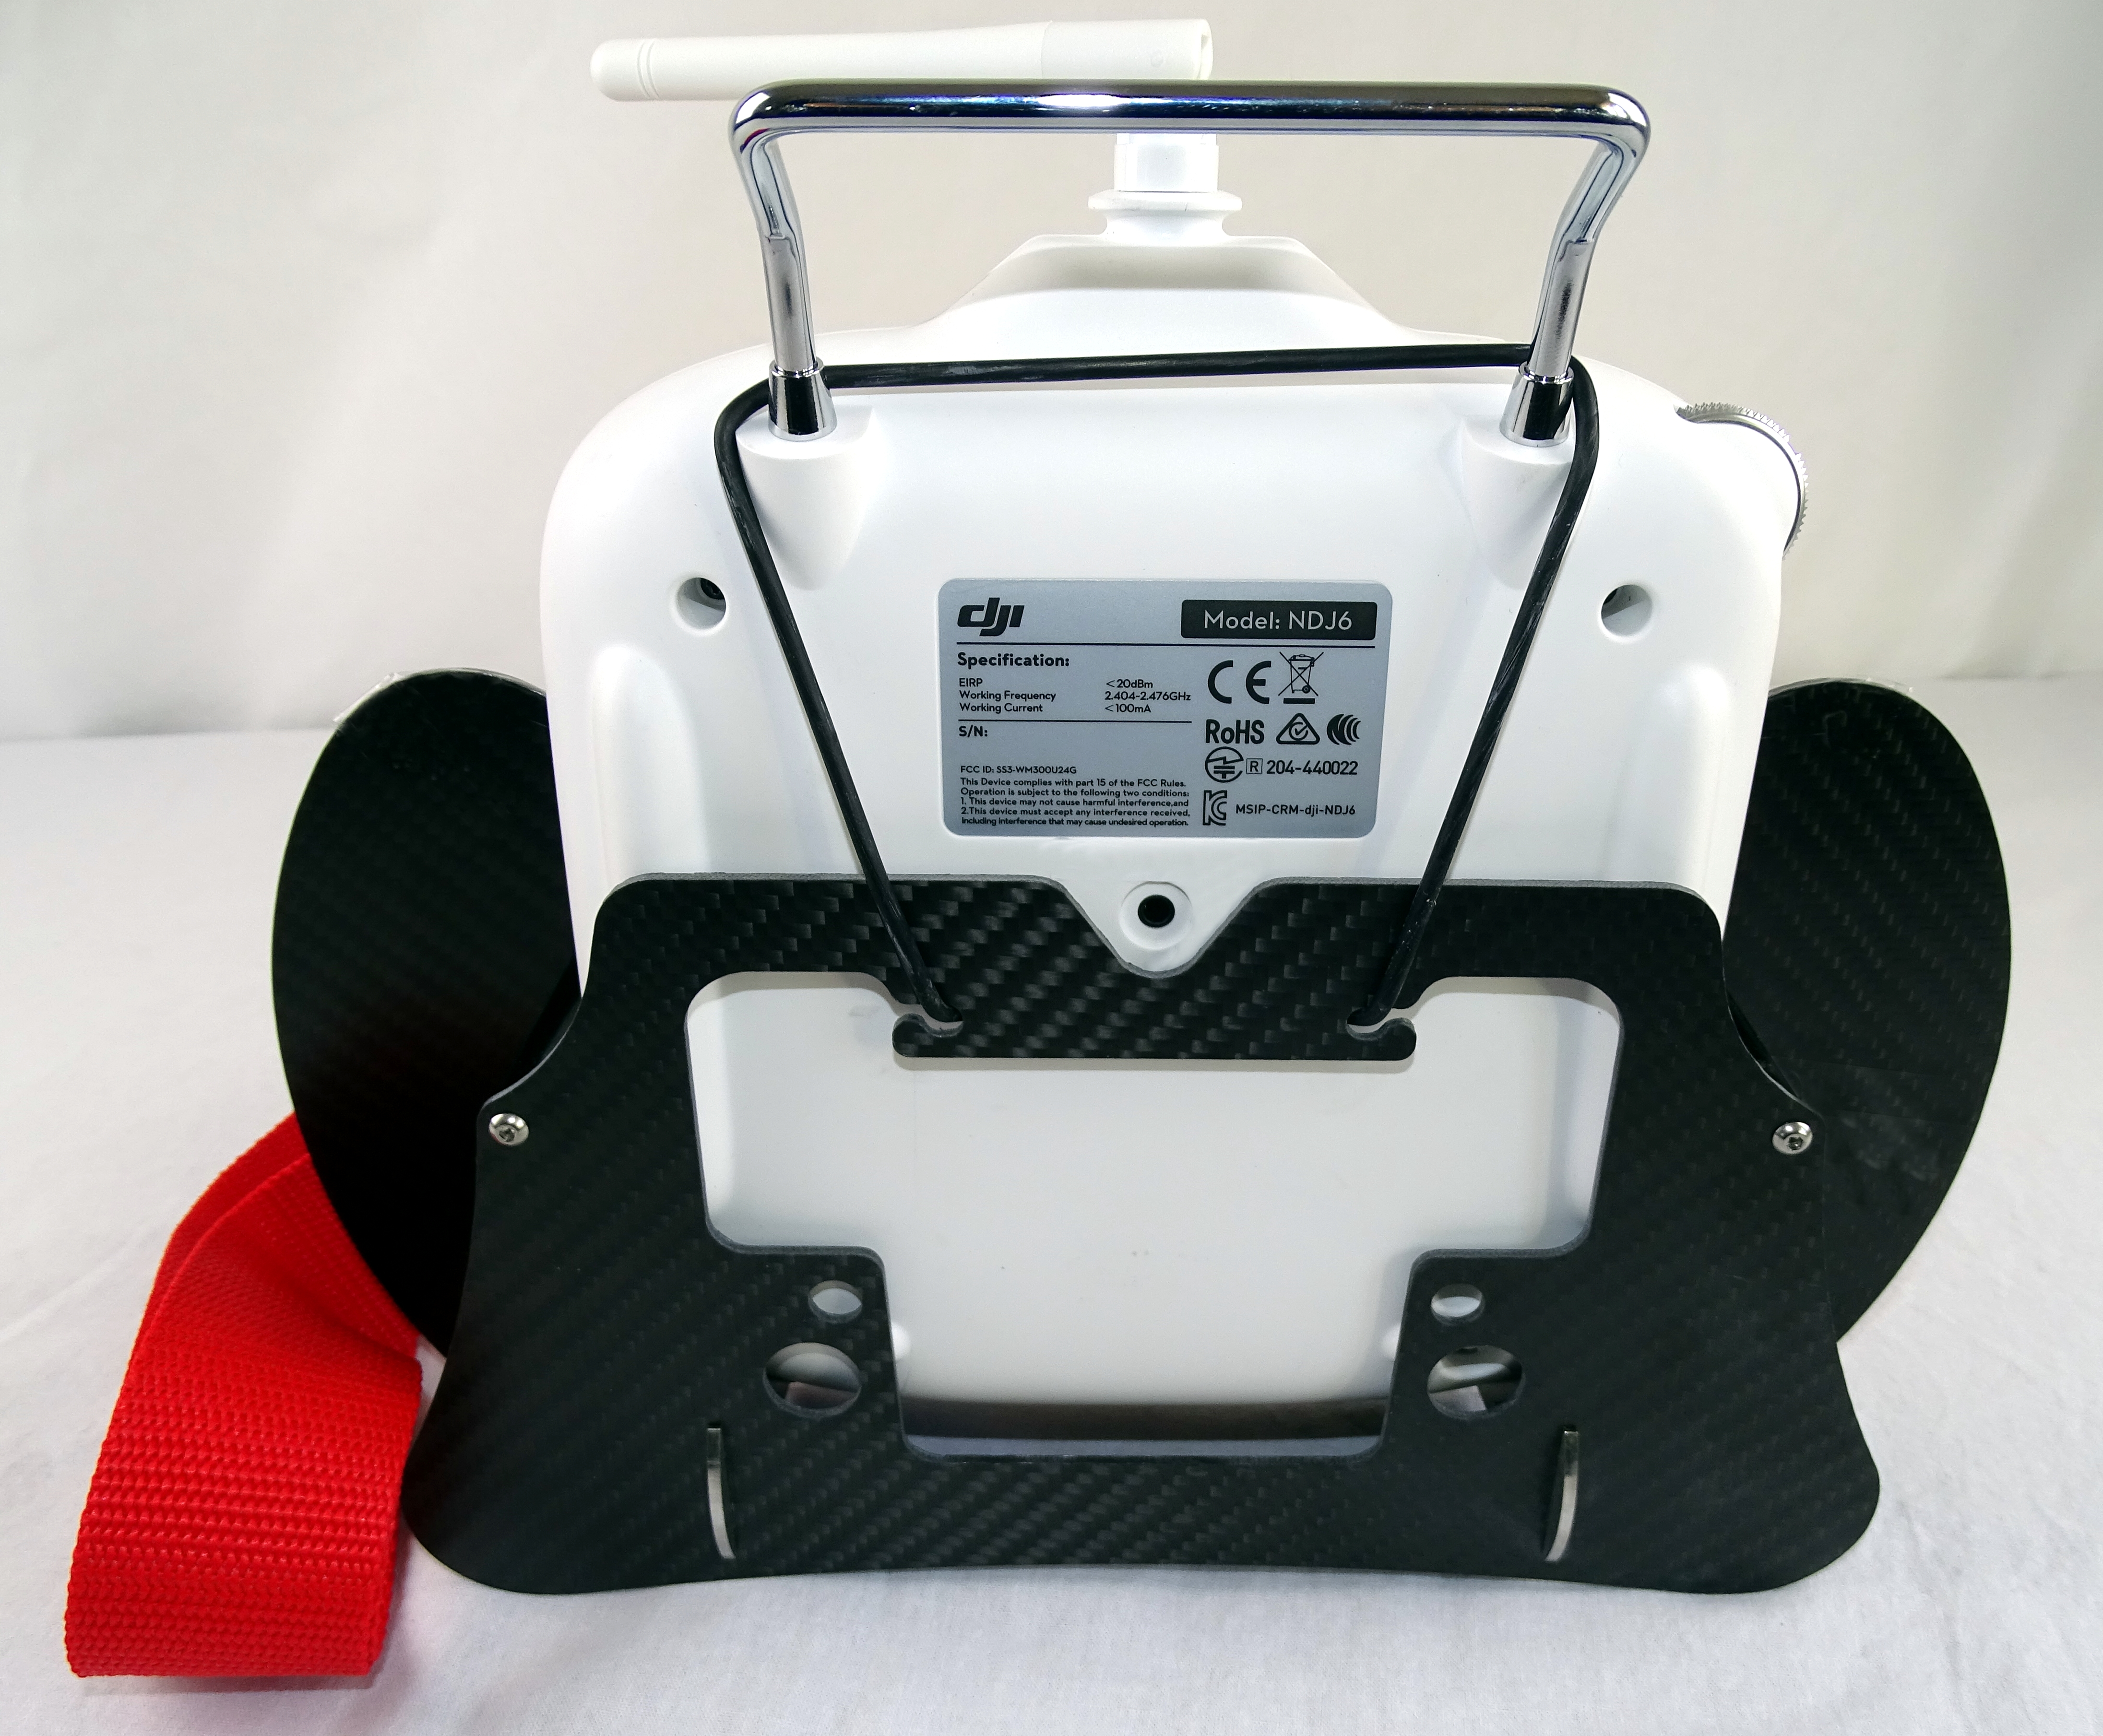 ahltecshop senderpult dji phantom 1 2 3 standard carbon. Black Bedroom Furniture Sets. Home Design Ideas